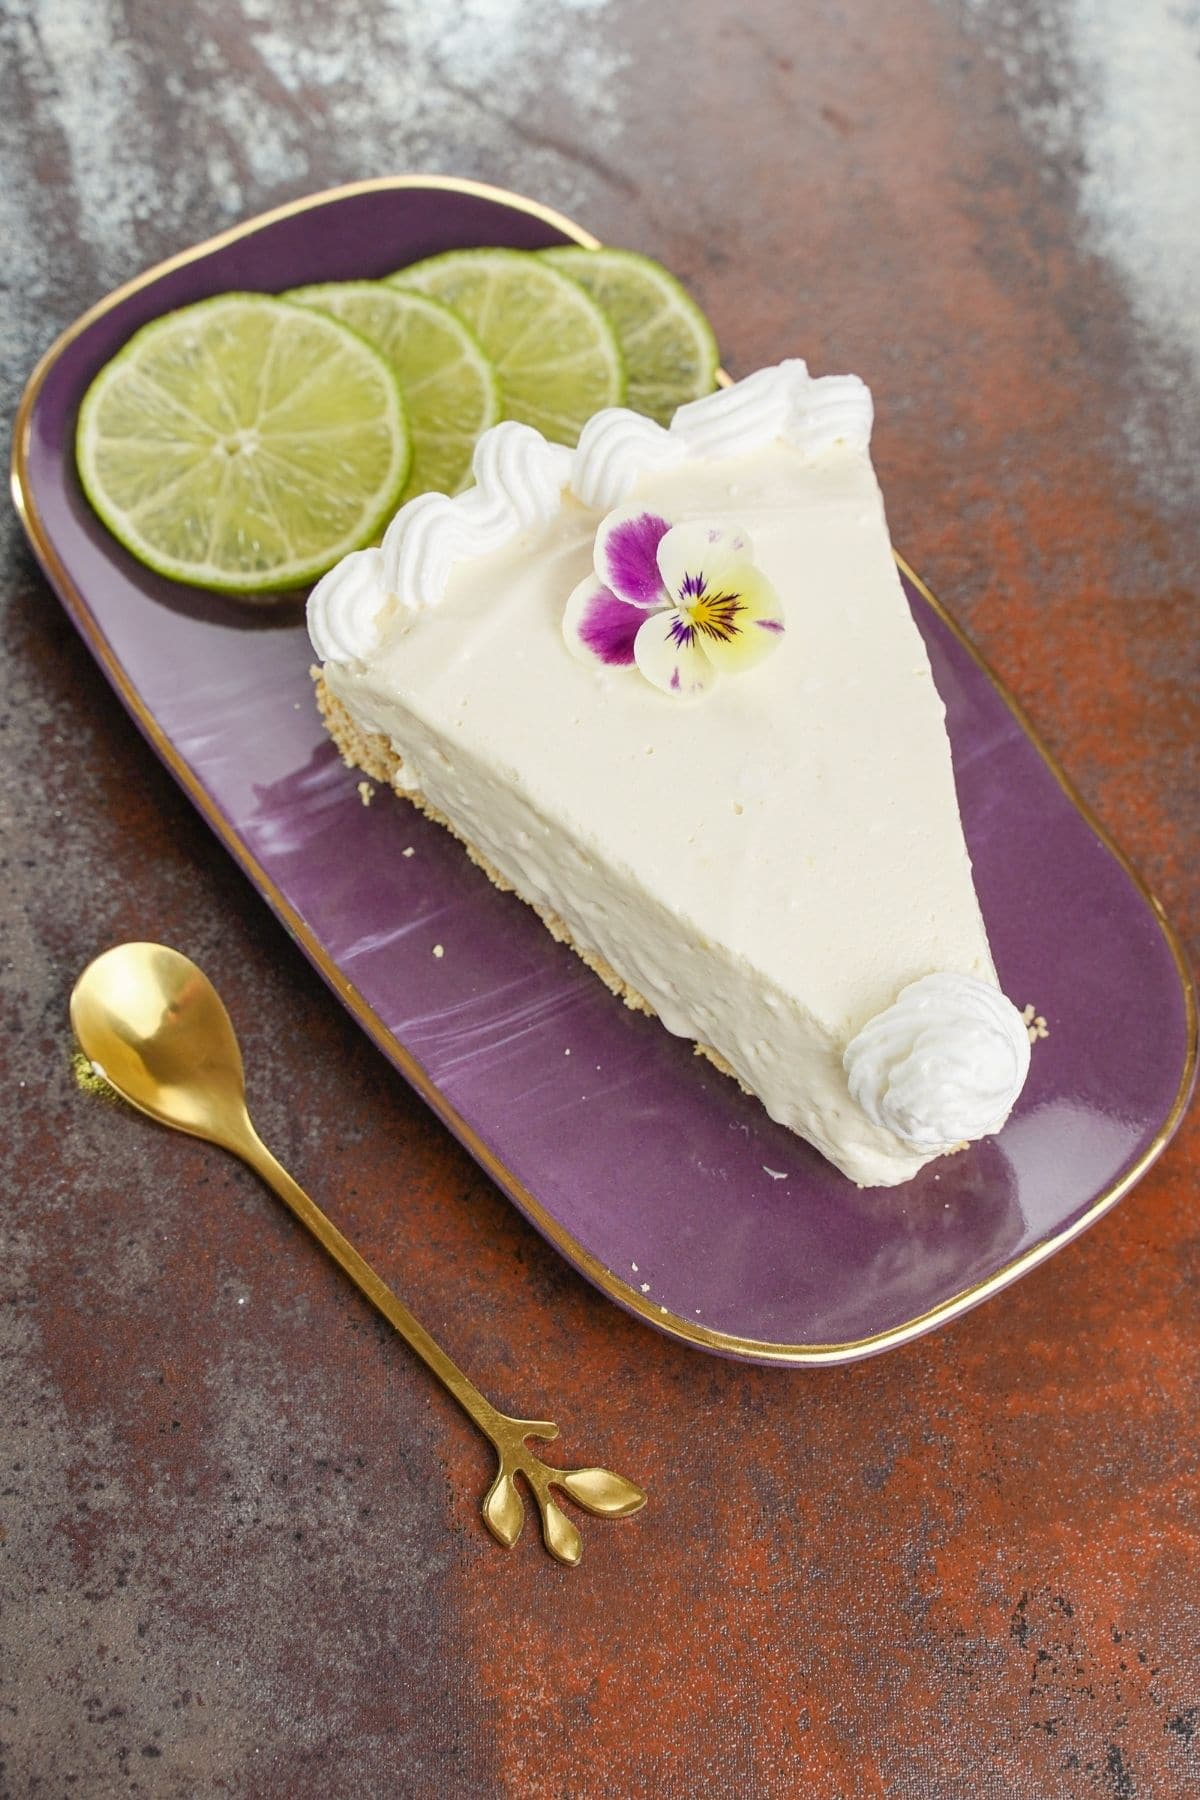 Lemon icebox pie slice on purple plate next to gold spoon